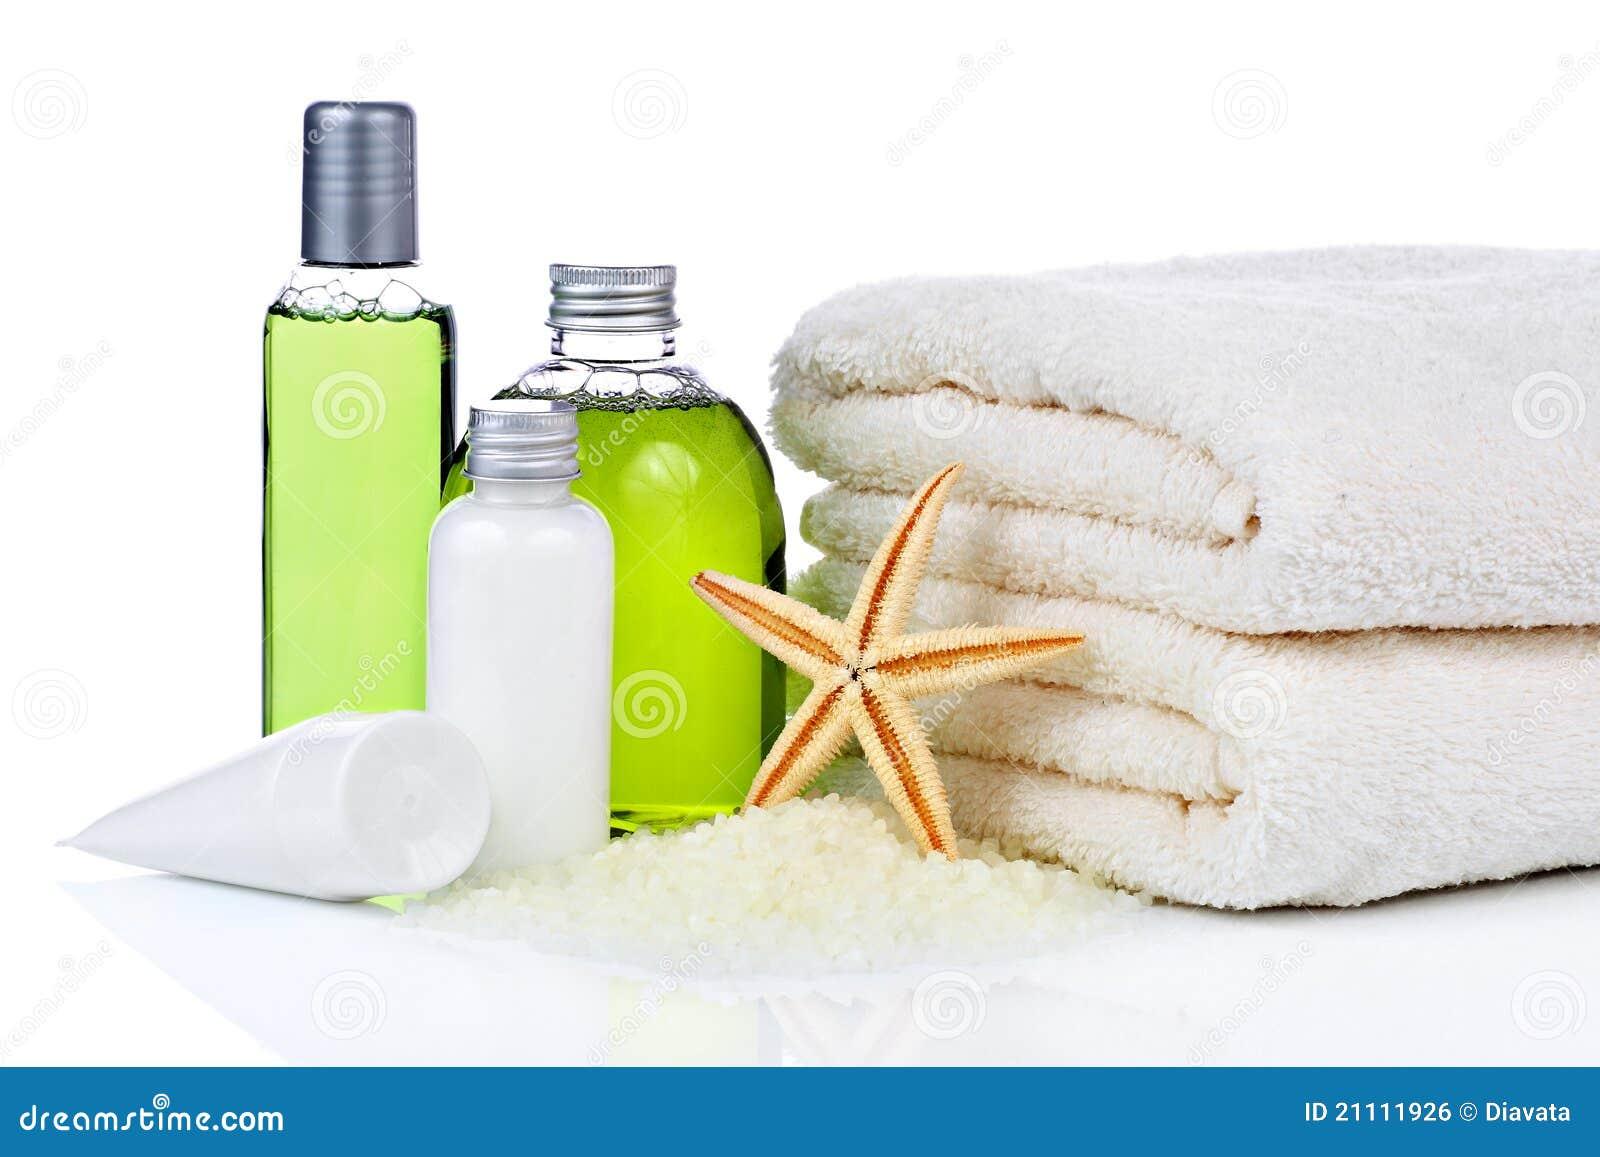 Free acne skin care samples